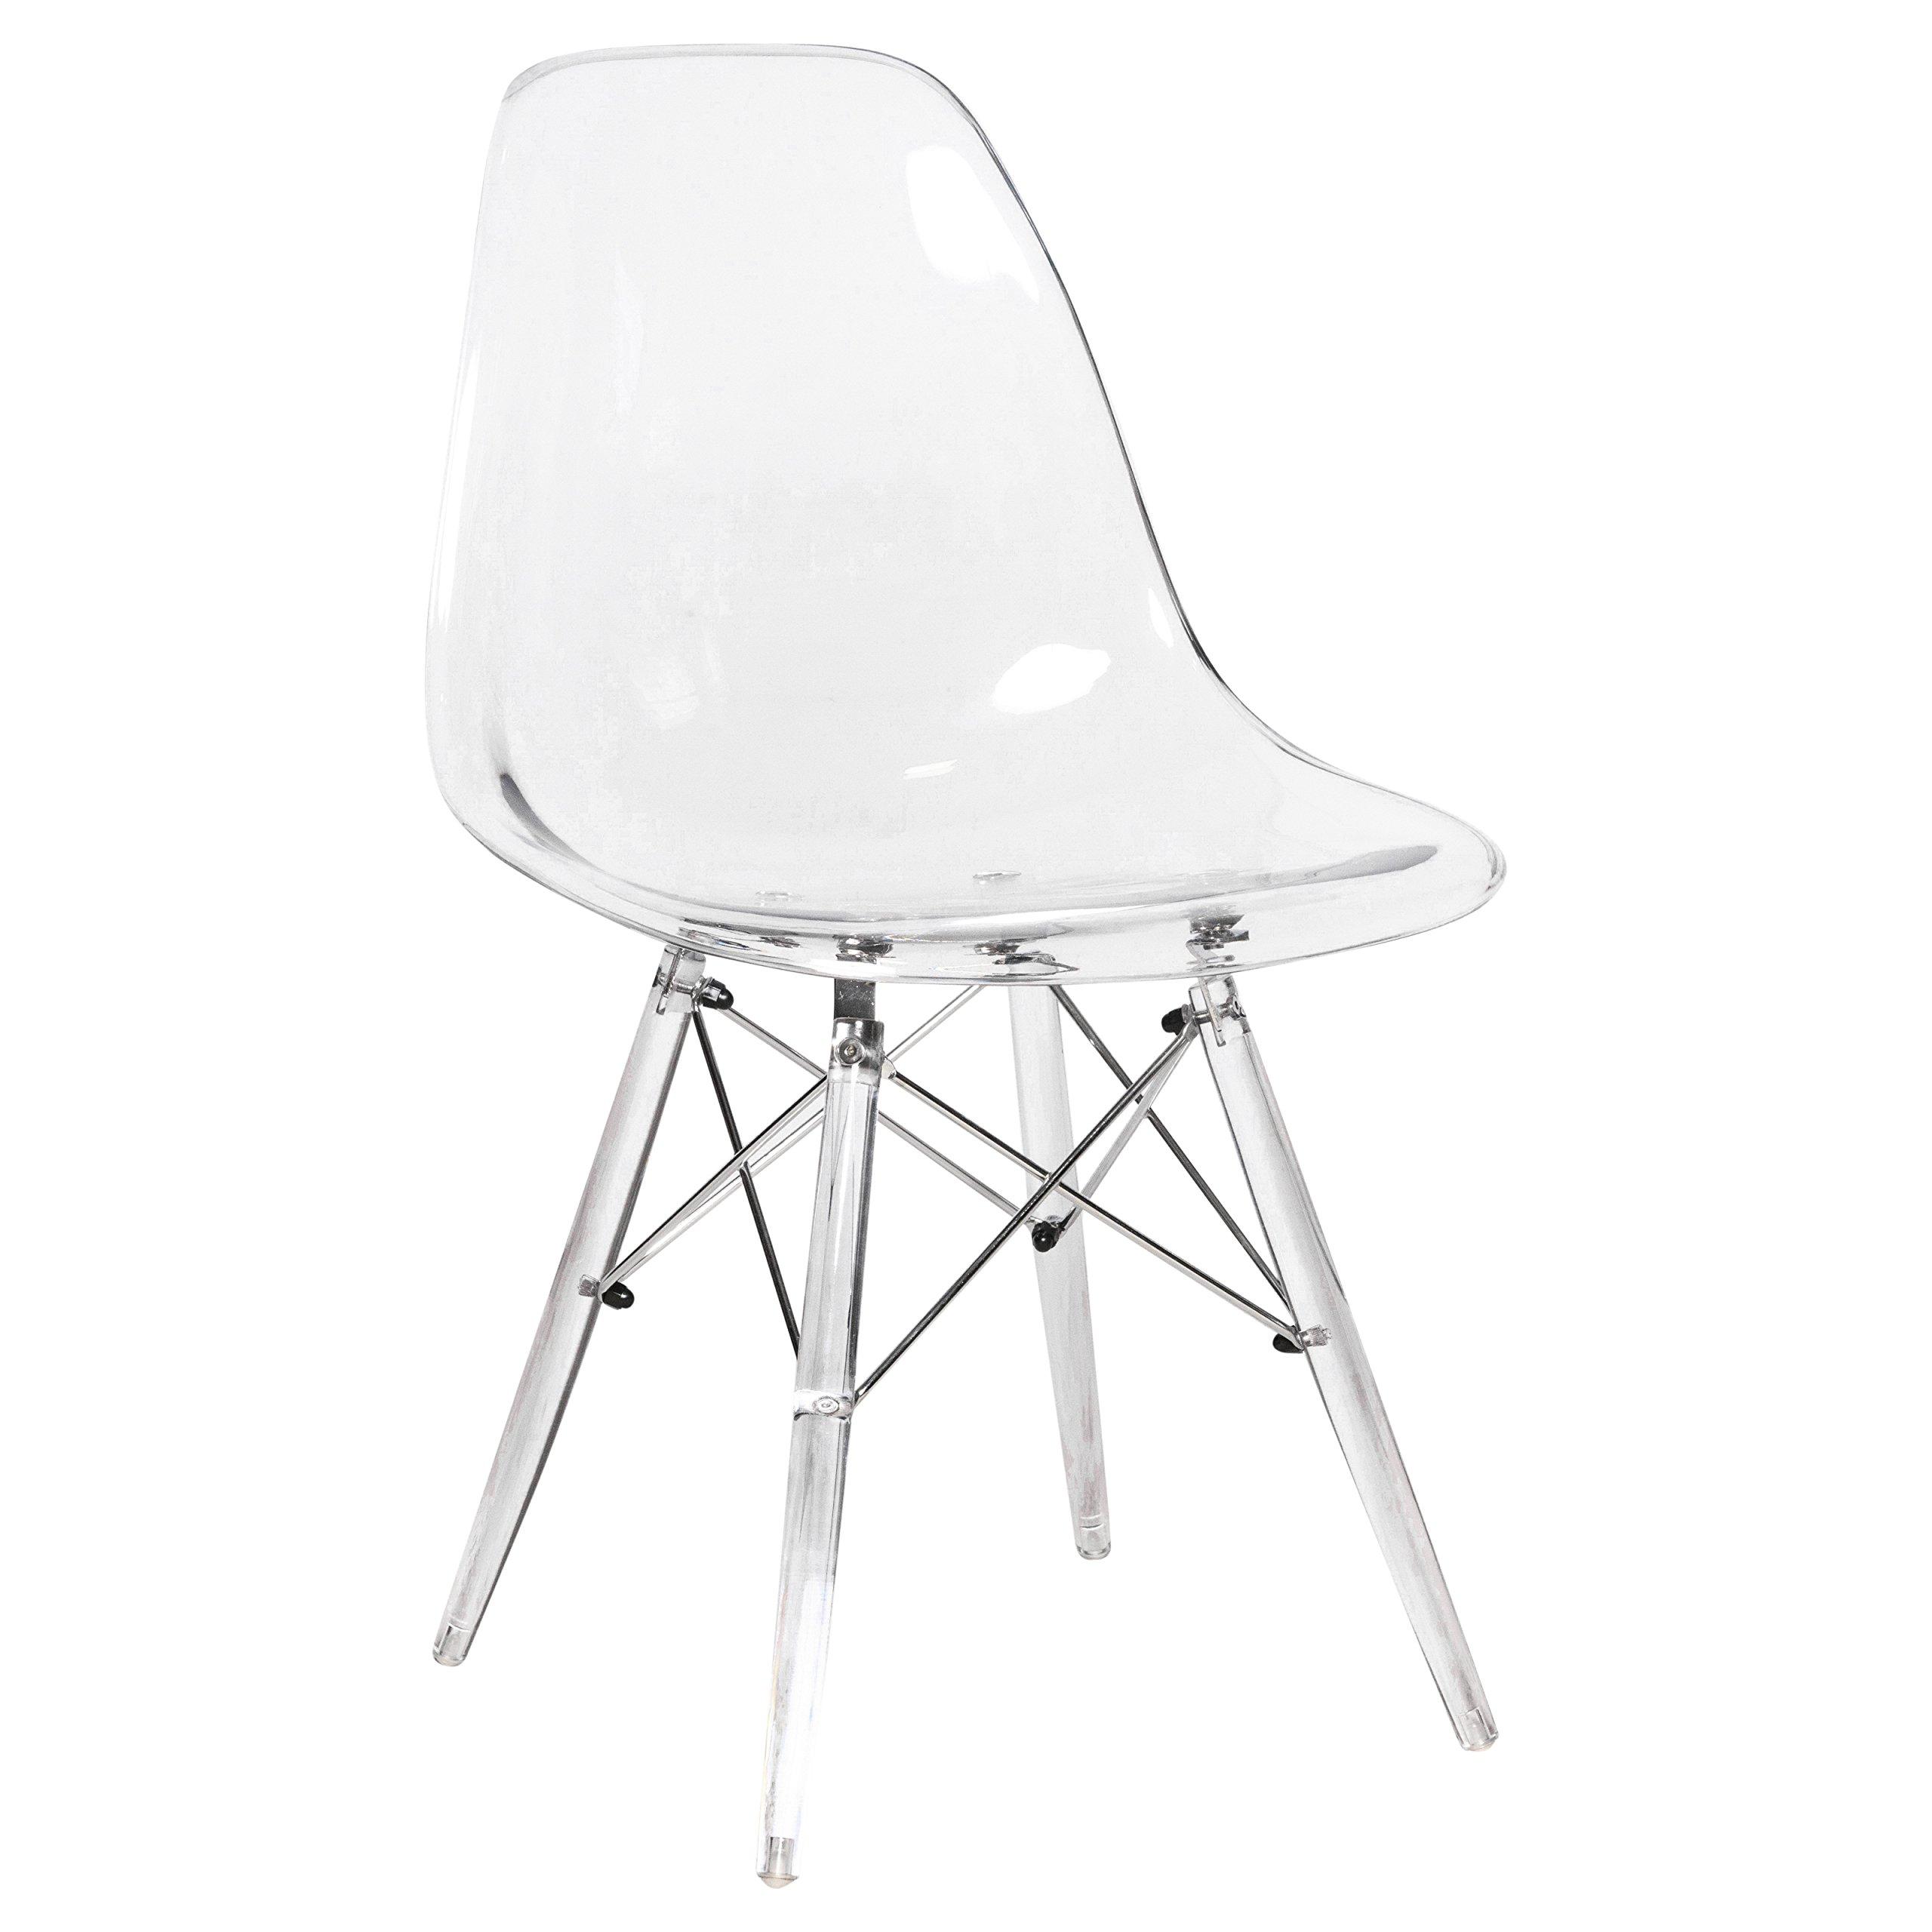 LeisureMod Calbert Molded Plastic Dining Chair with Acrylic Eiffel Base (Clear)